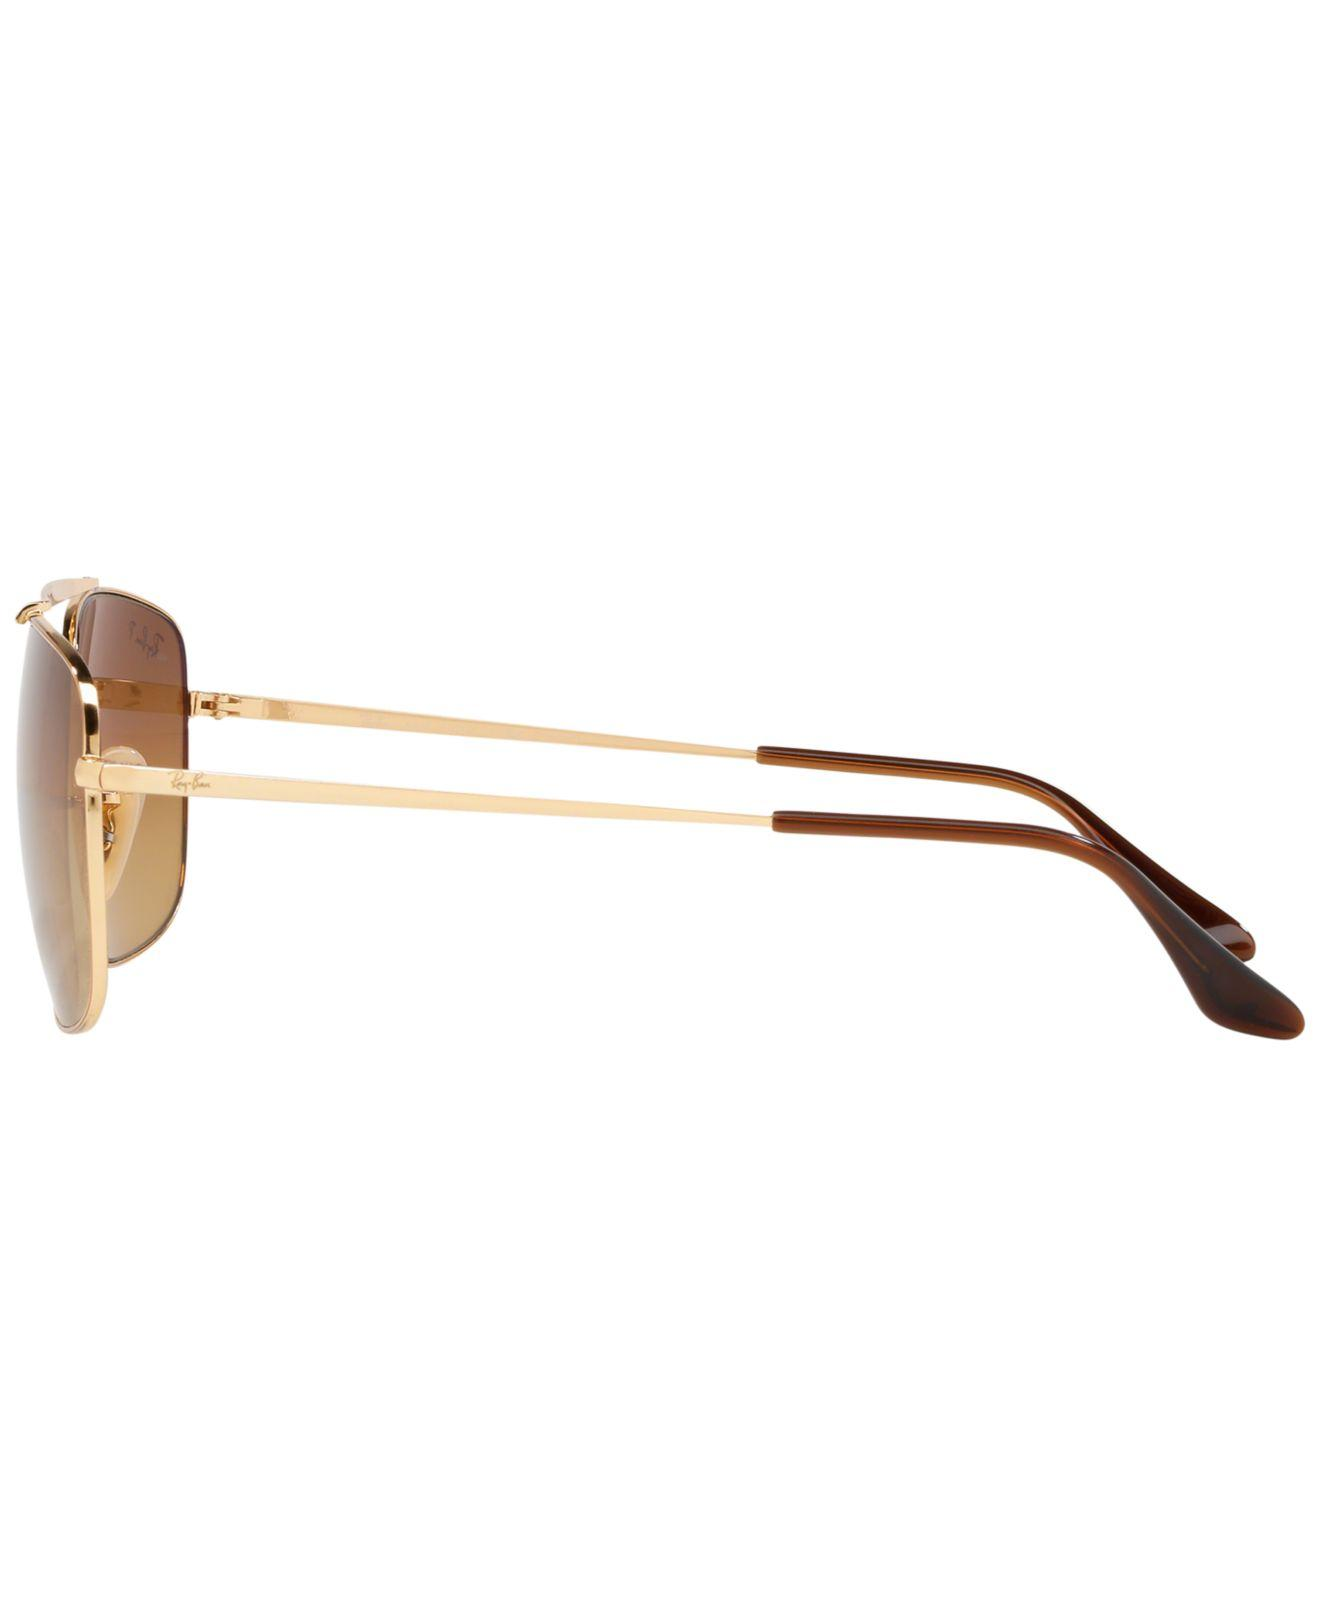 538b1db116b Lyst - Ray-Ban Polarized Sunglasses